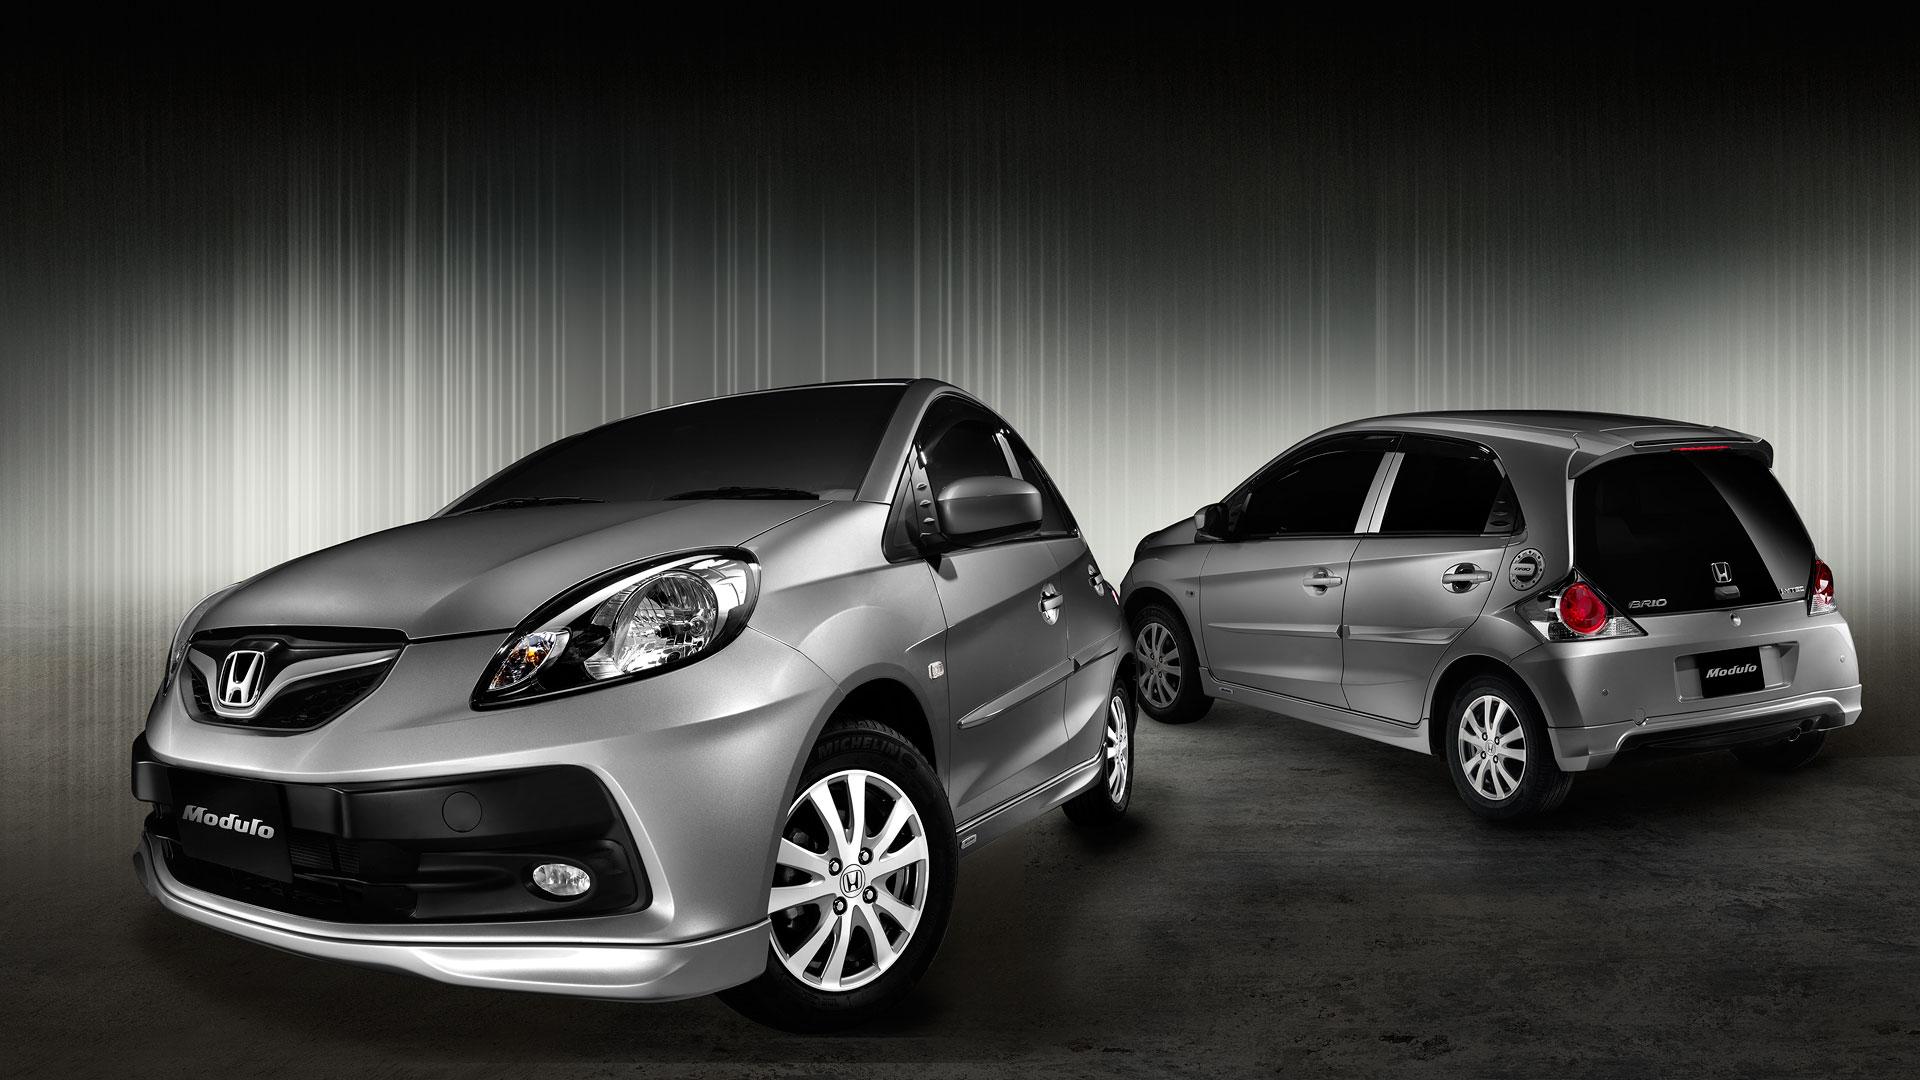 Honda-Brio-wallpaper